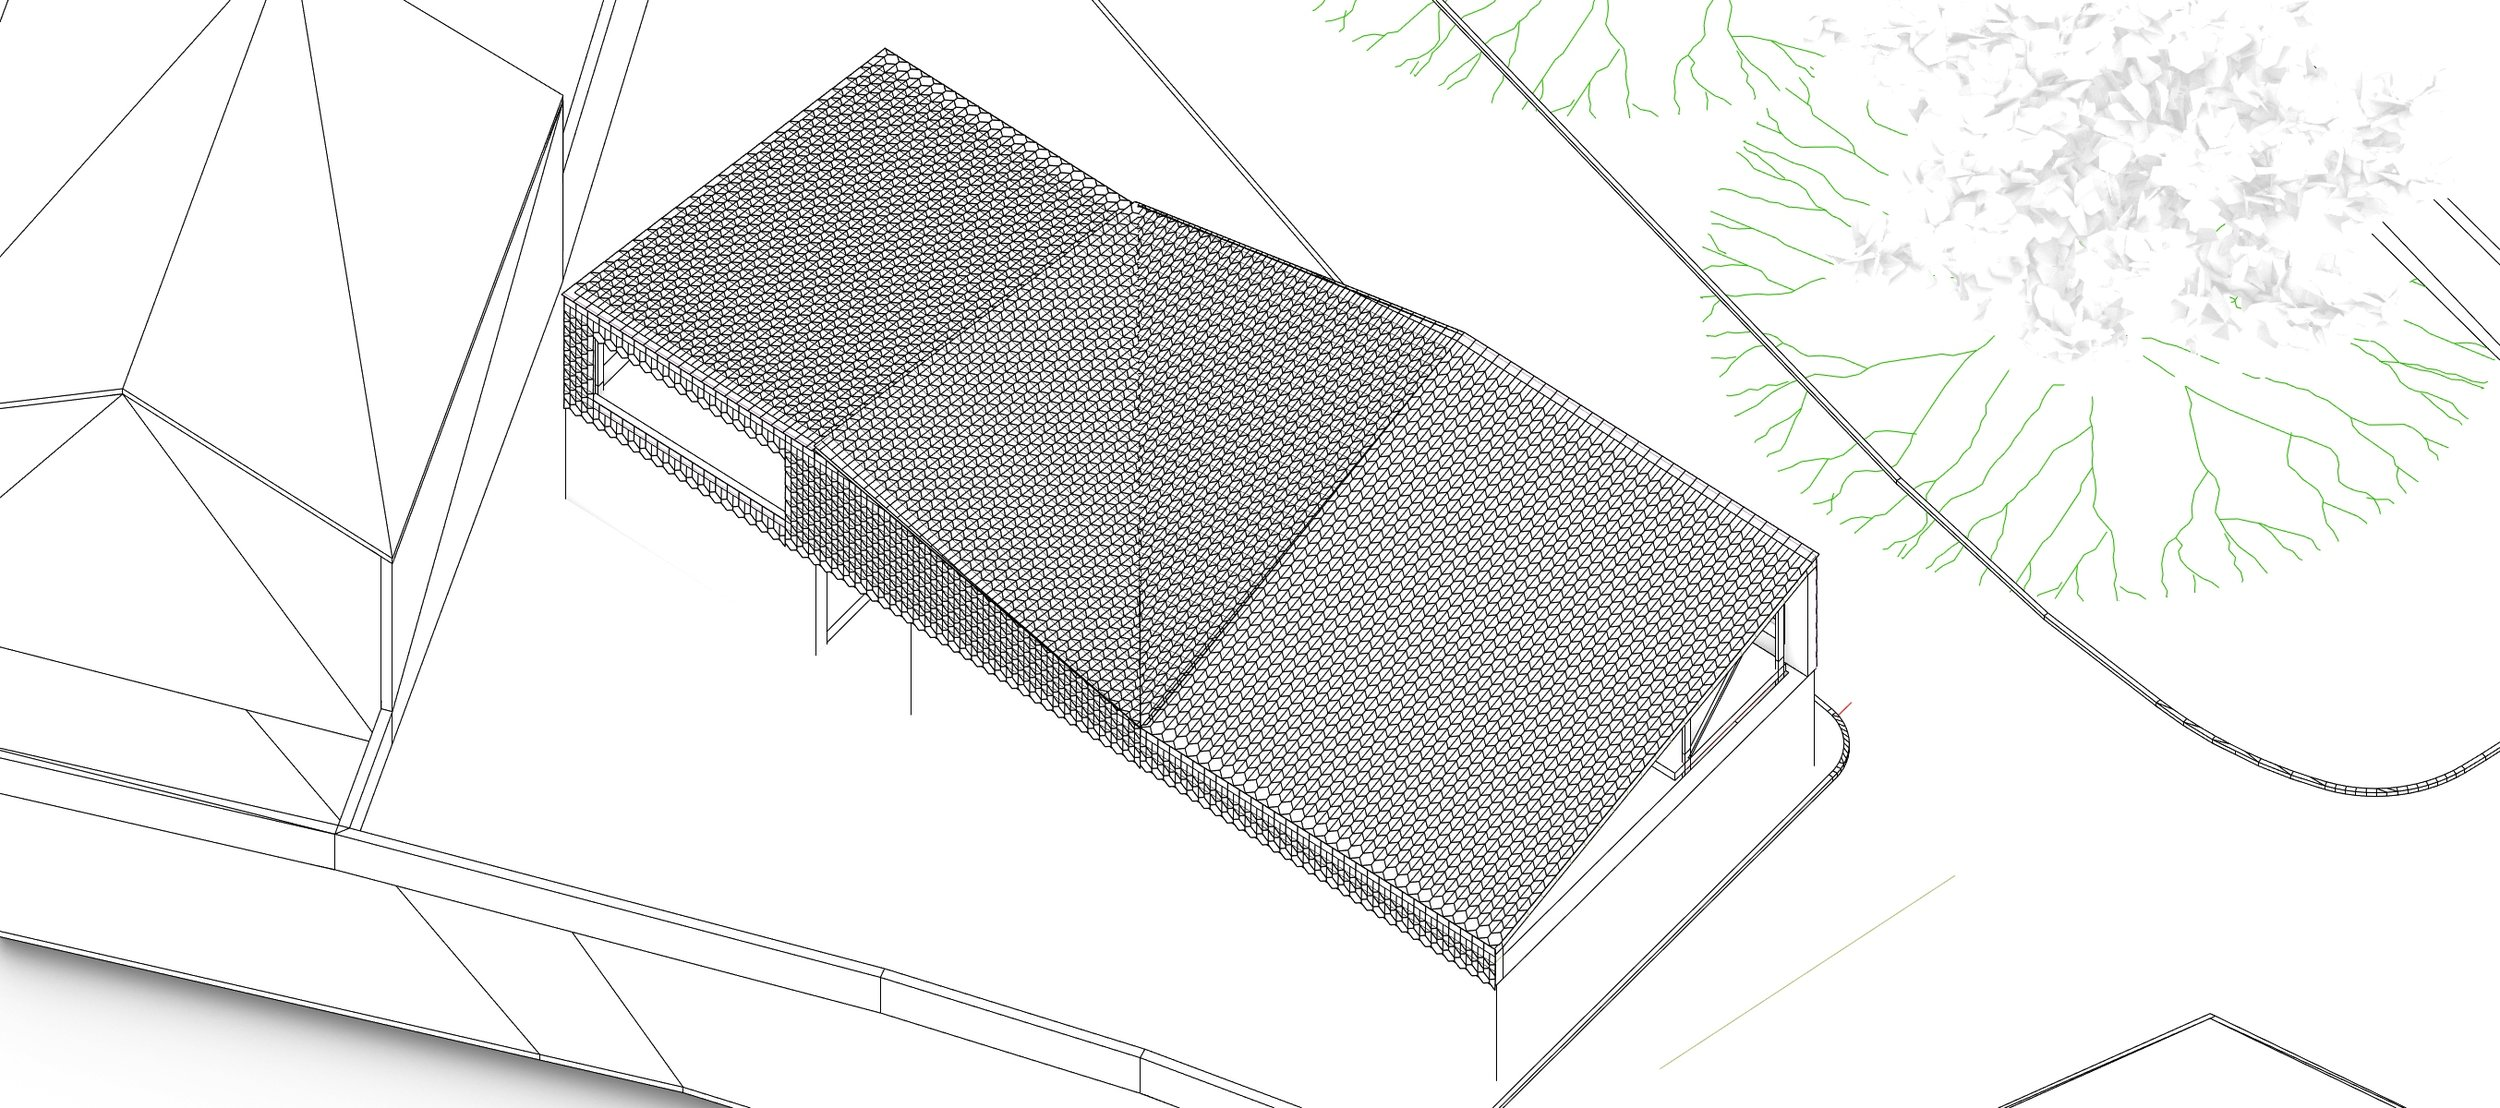 Roof Plan Mosaic 6.JPG